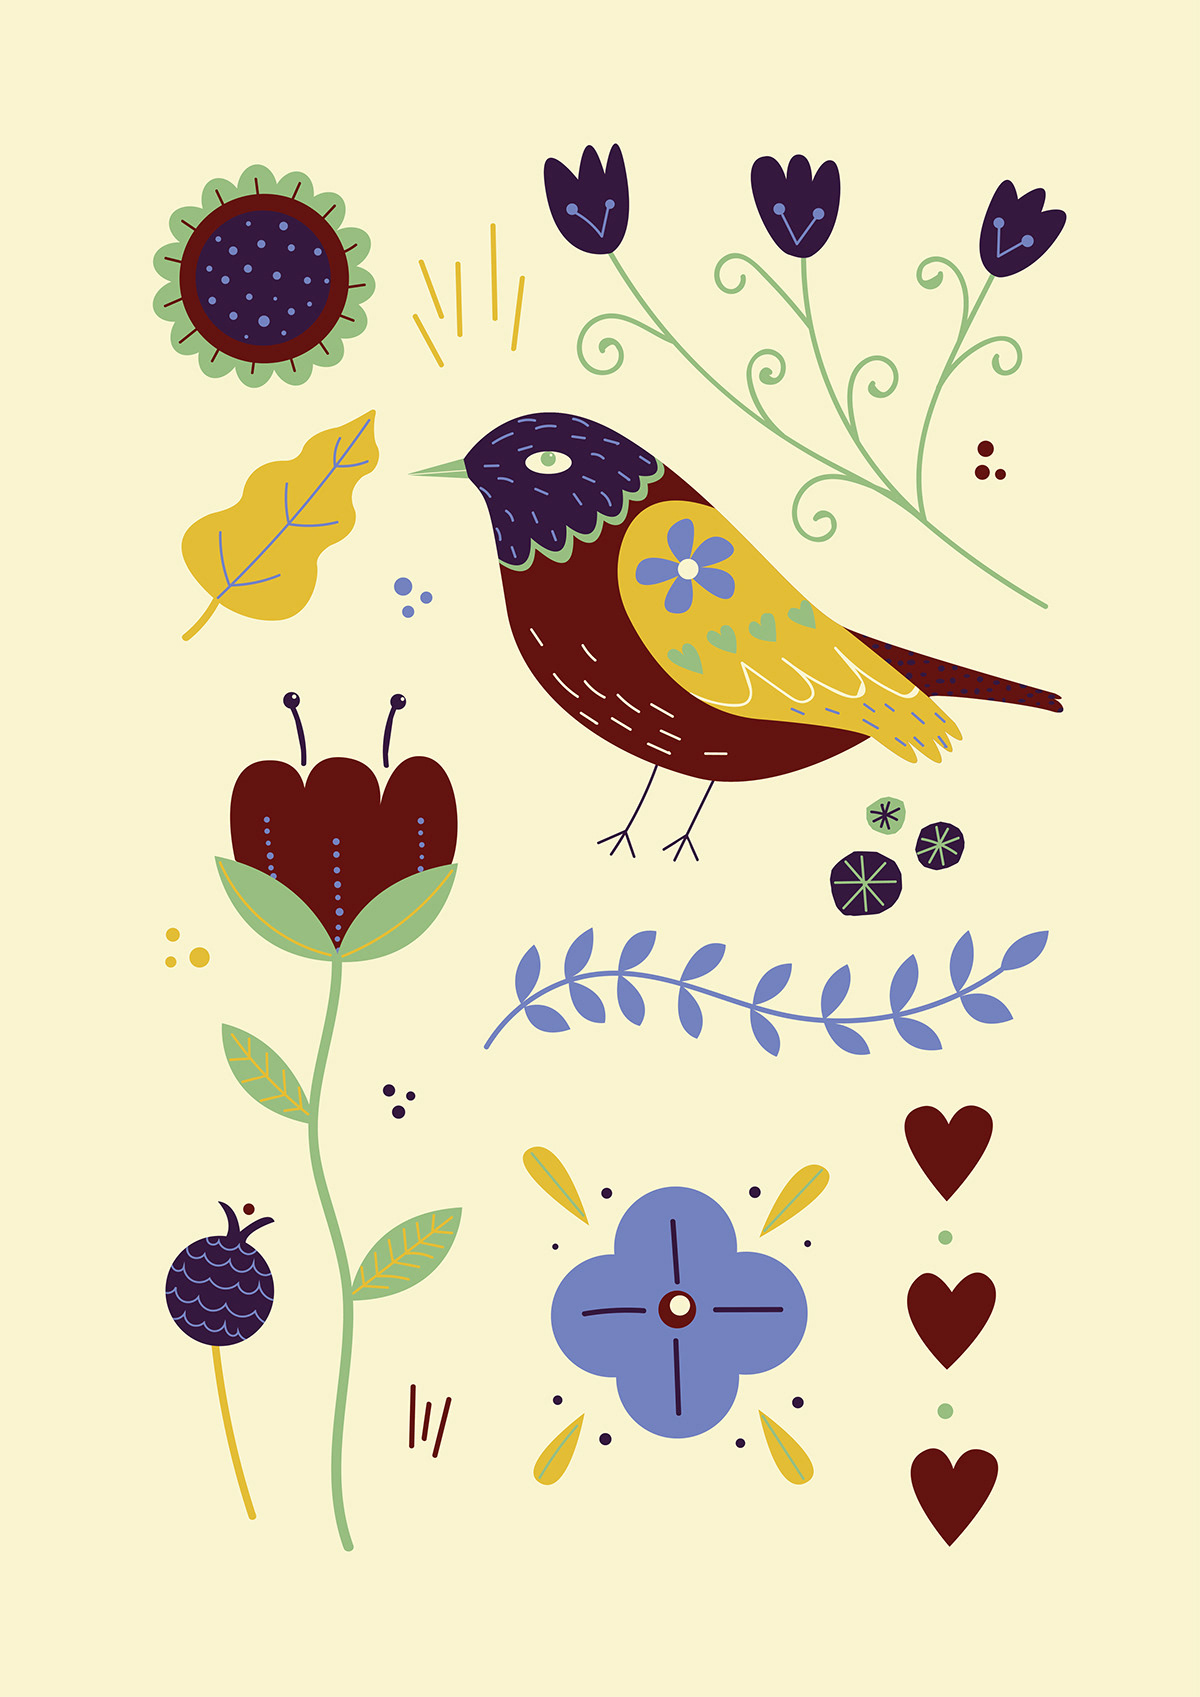 decorative illustration folk art illustration Modern Folk Art pattern design  pattern illustration bird floral flower Nature Plant